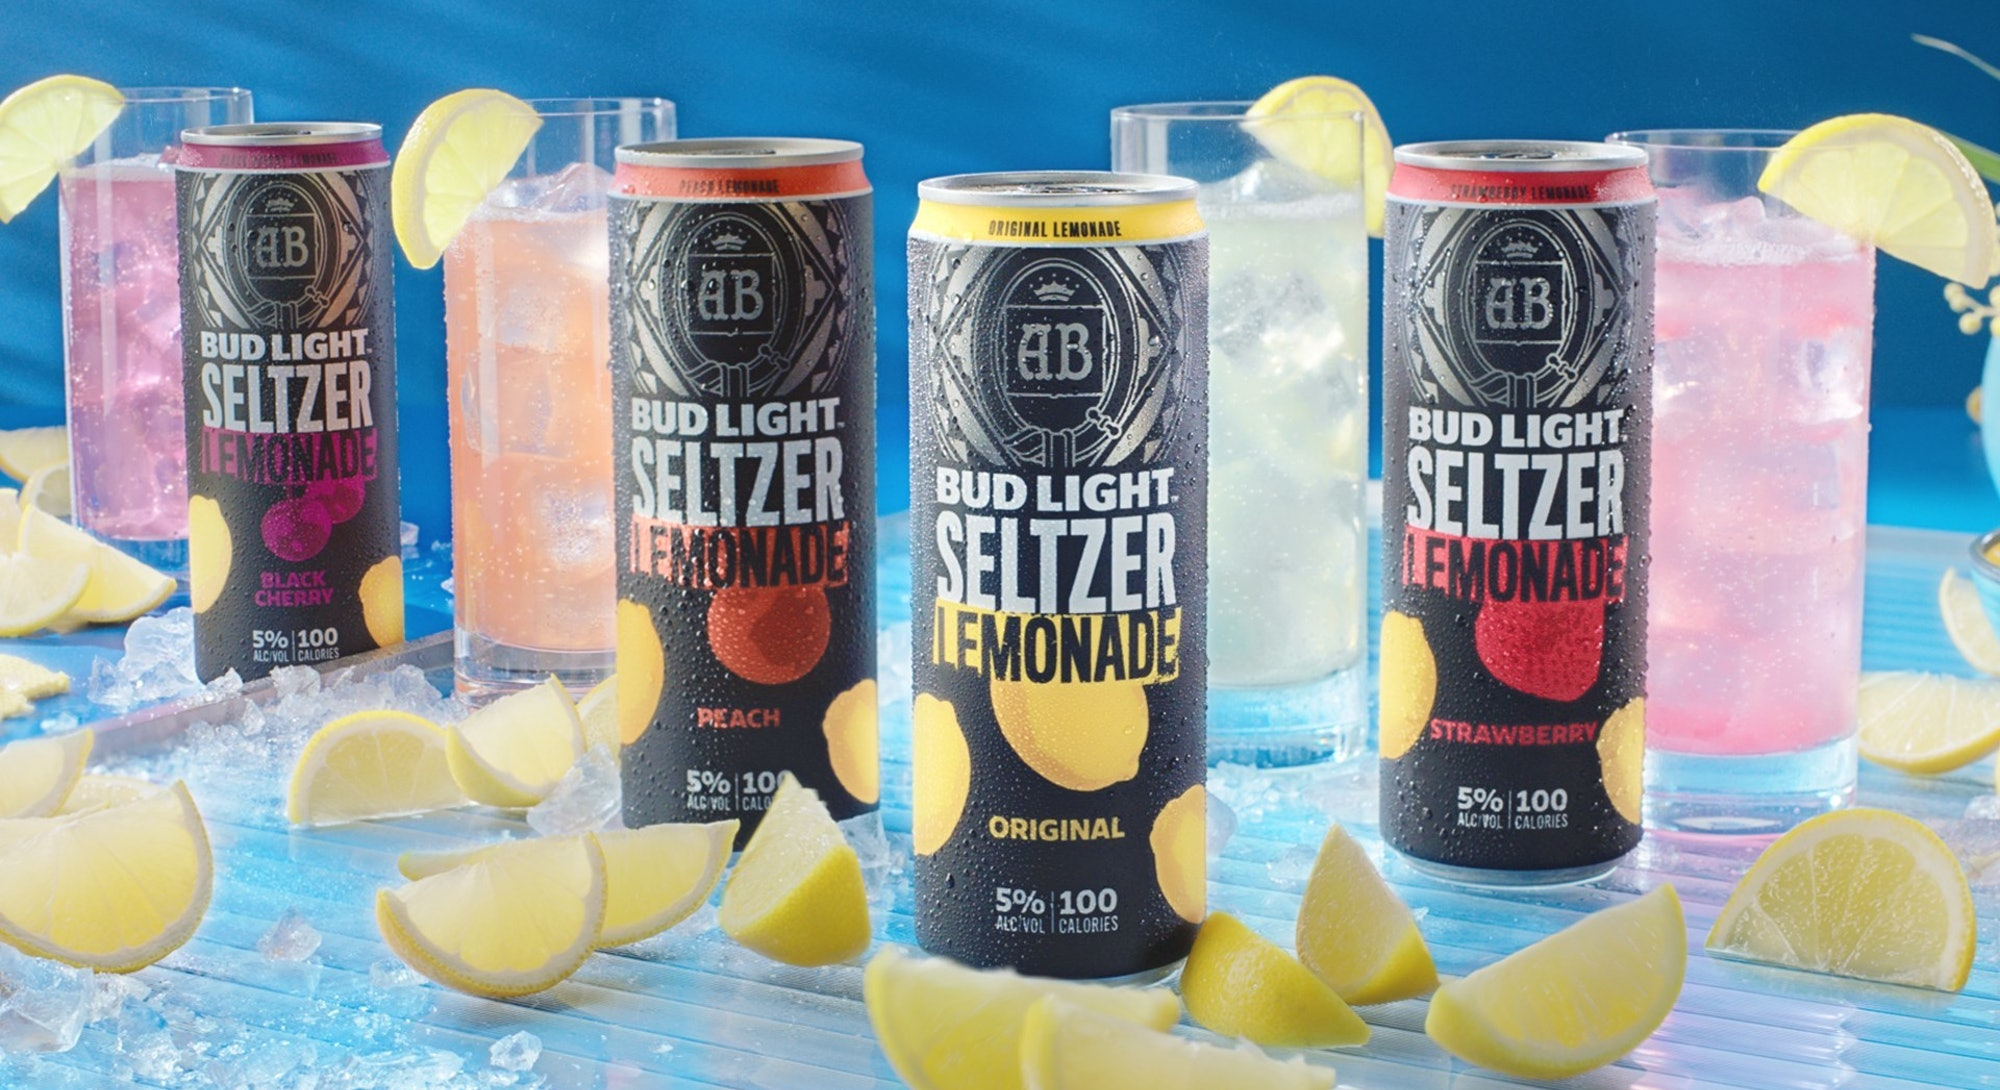 Bud Light released a line of four hard seltzer lemonades.